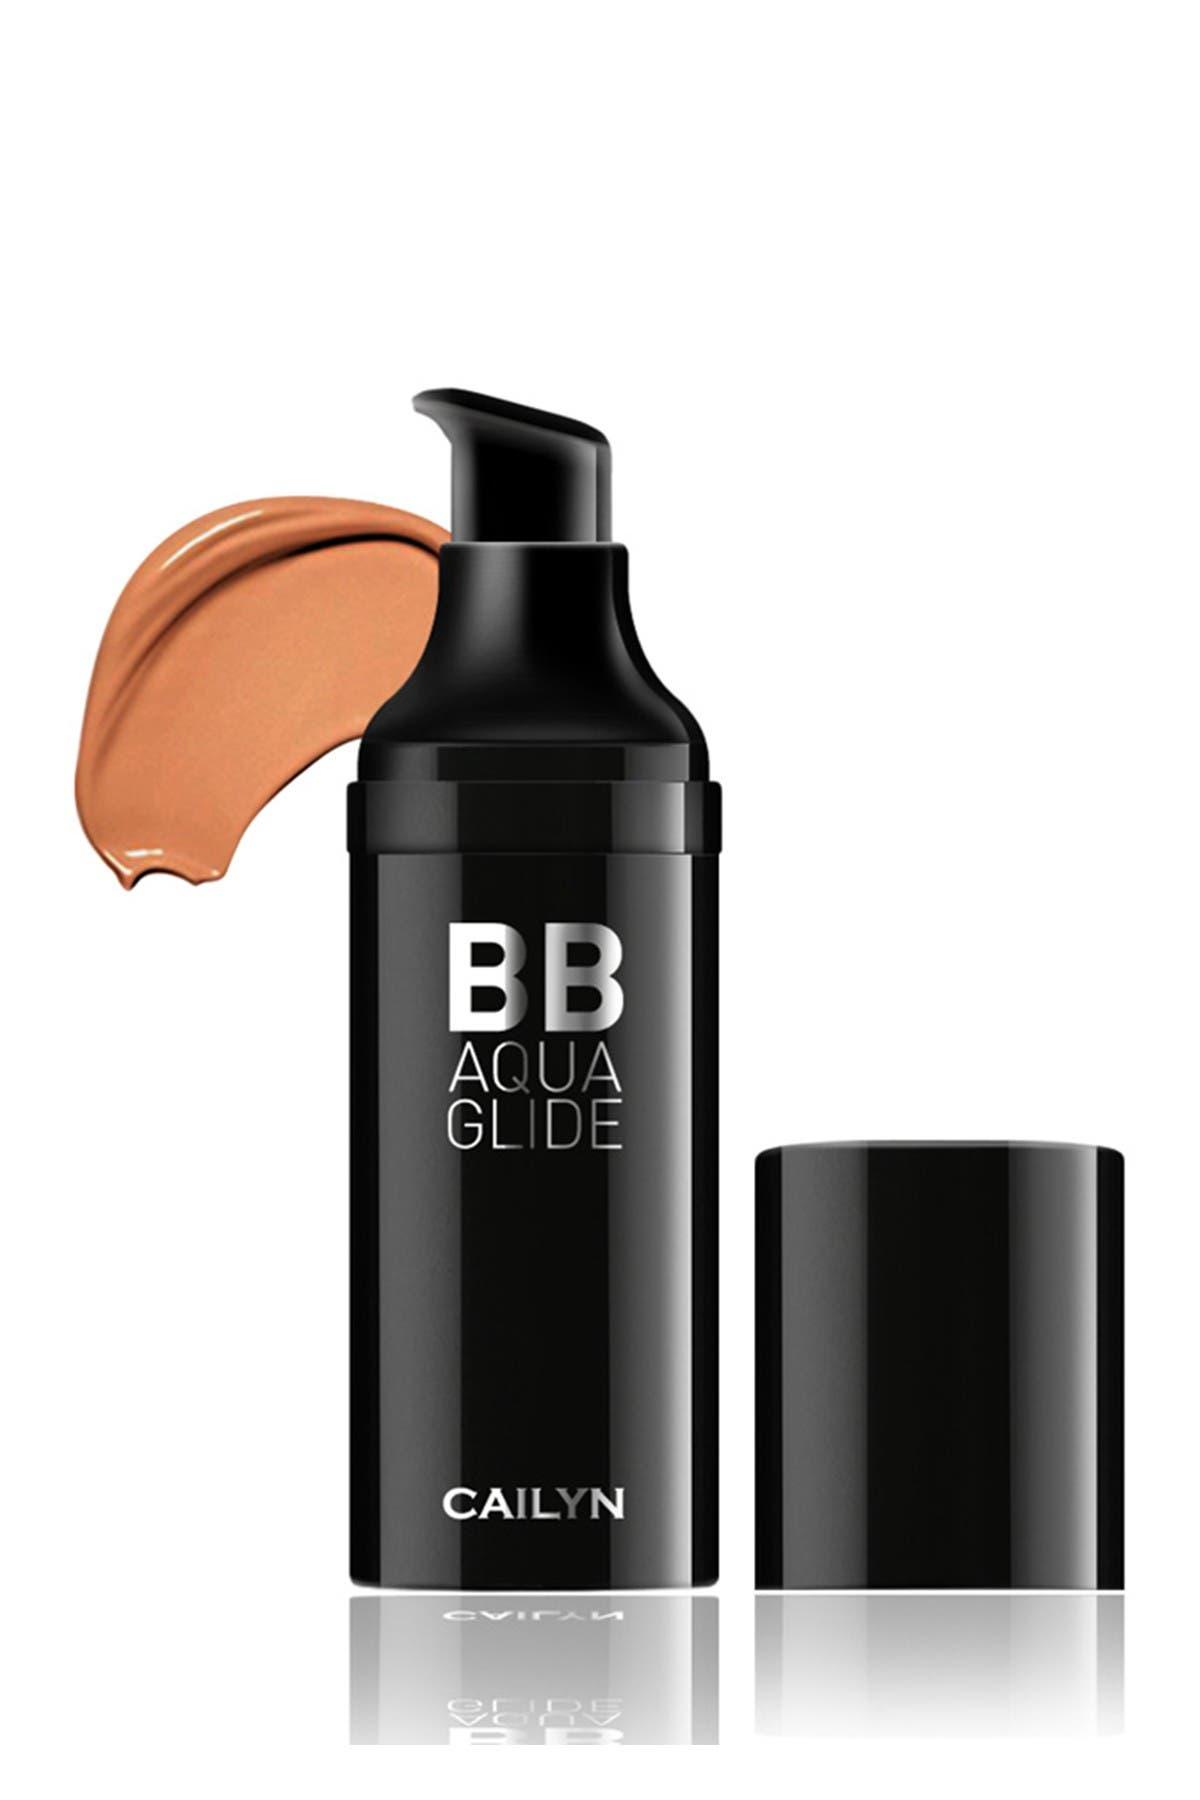 Cailyn Cosmetics Bb Aqua Glide 3-in-1 Moisturizer In Cream Caramel